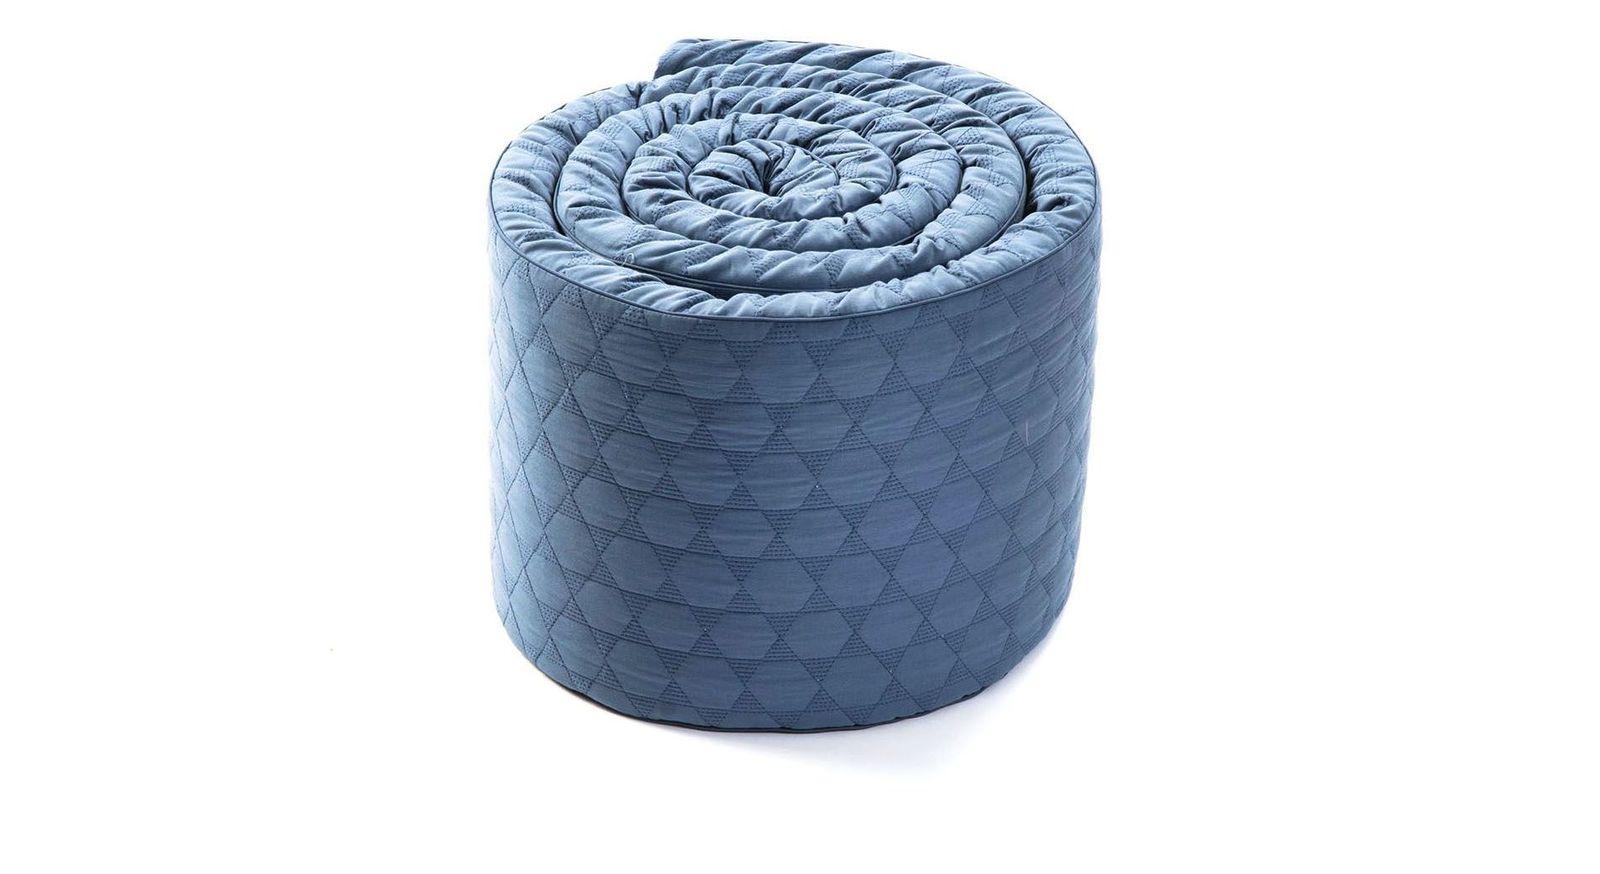 LIFETIME Nestchen Original in Blau